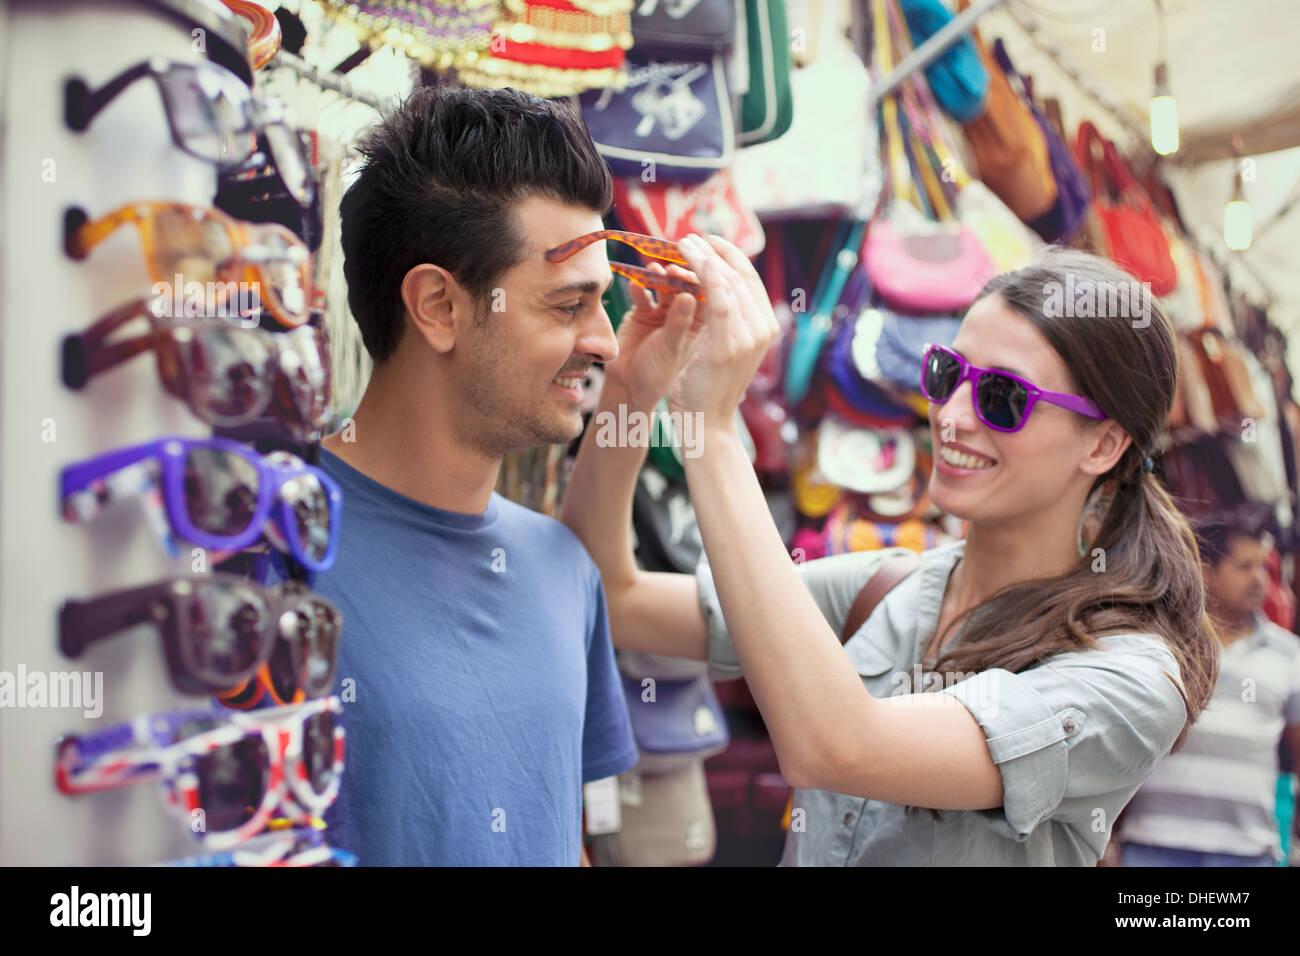 Young couple trying on sunglasses, San Lorenzo market, Florence, Tuscany, Italy - Stock Image